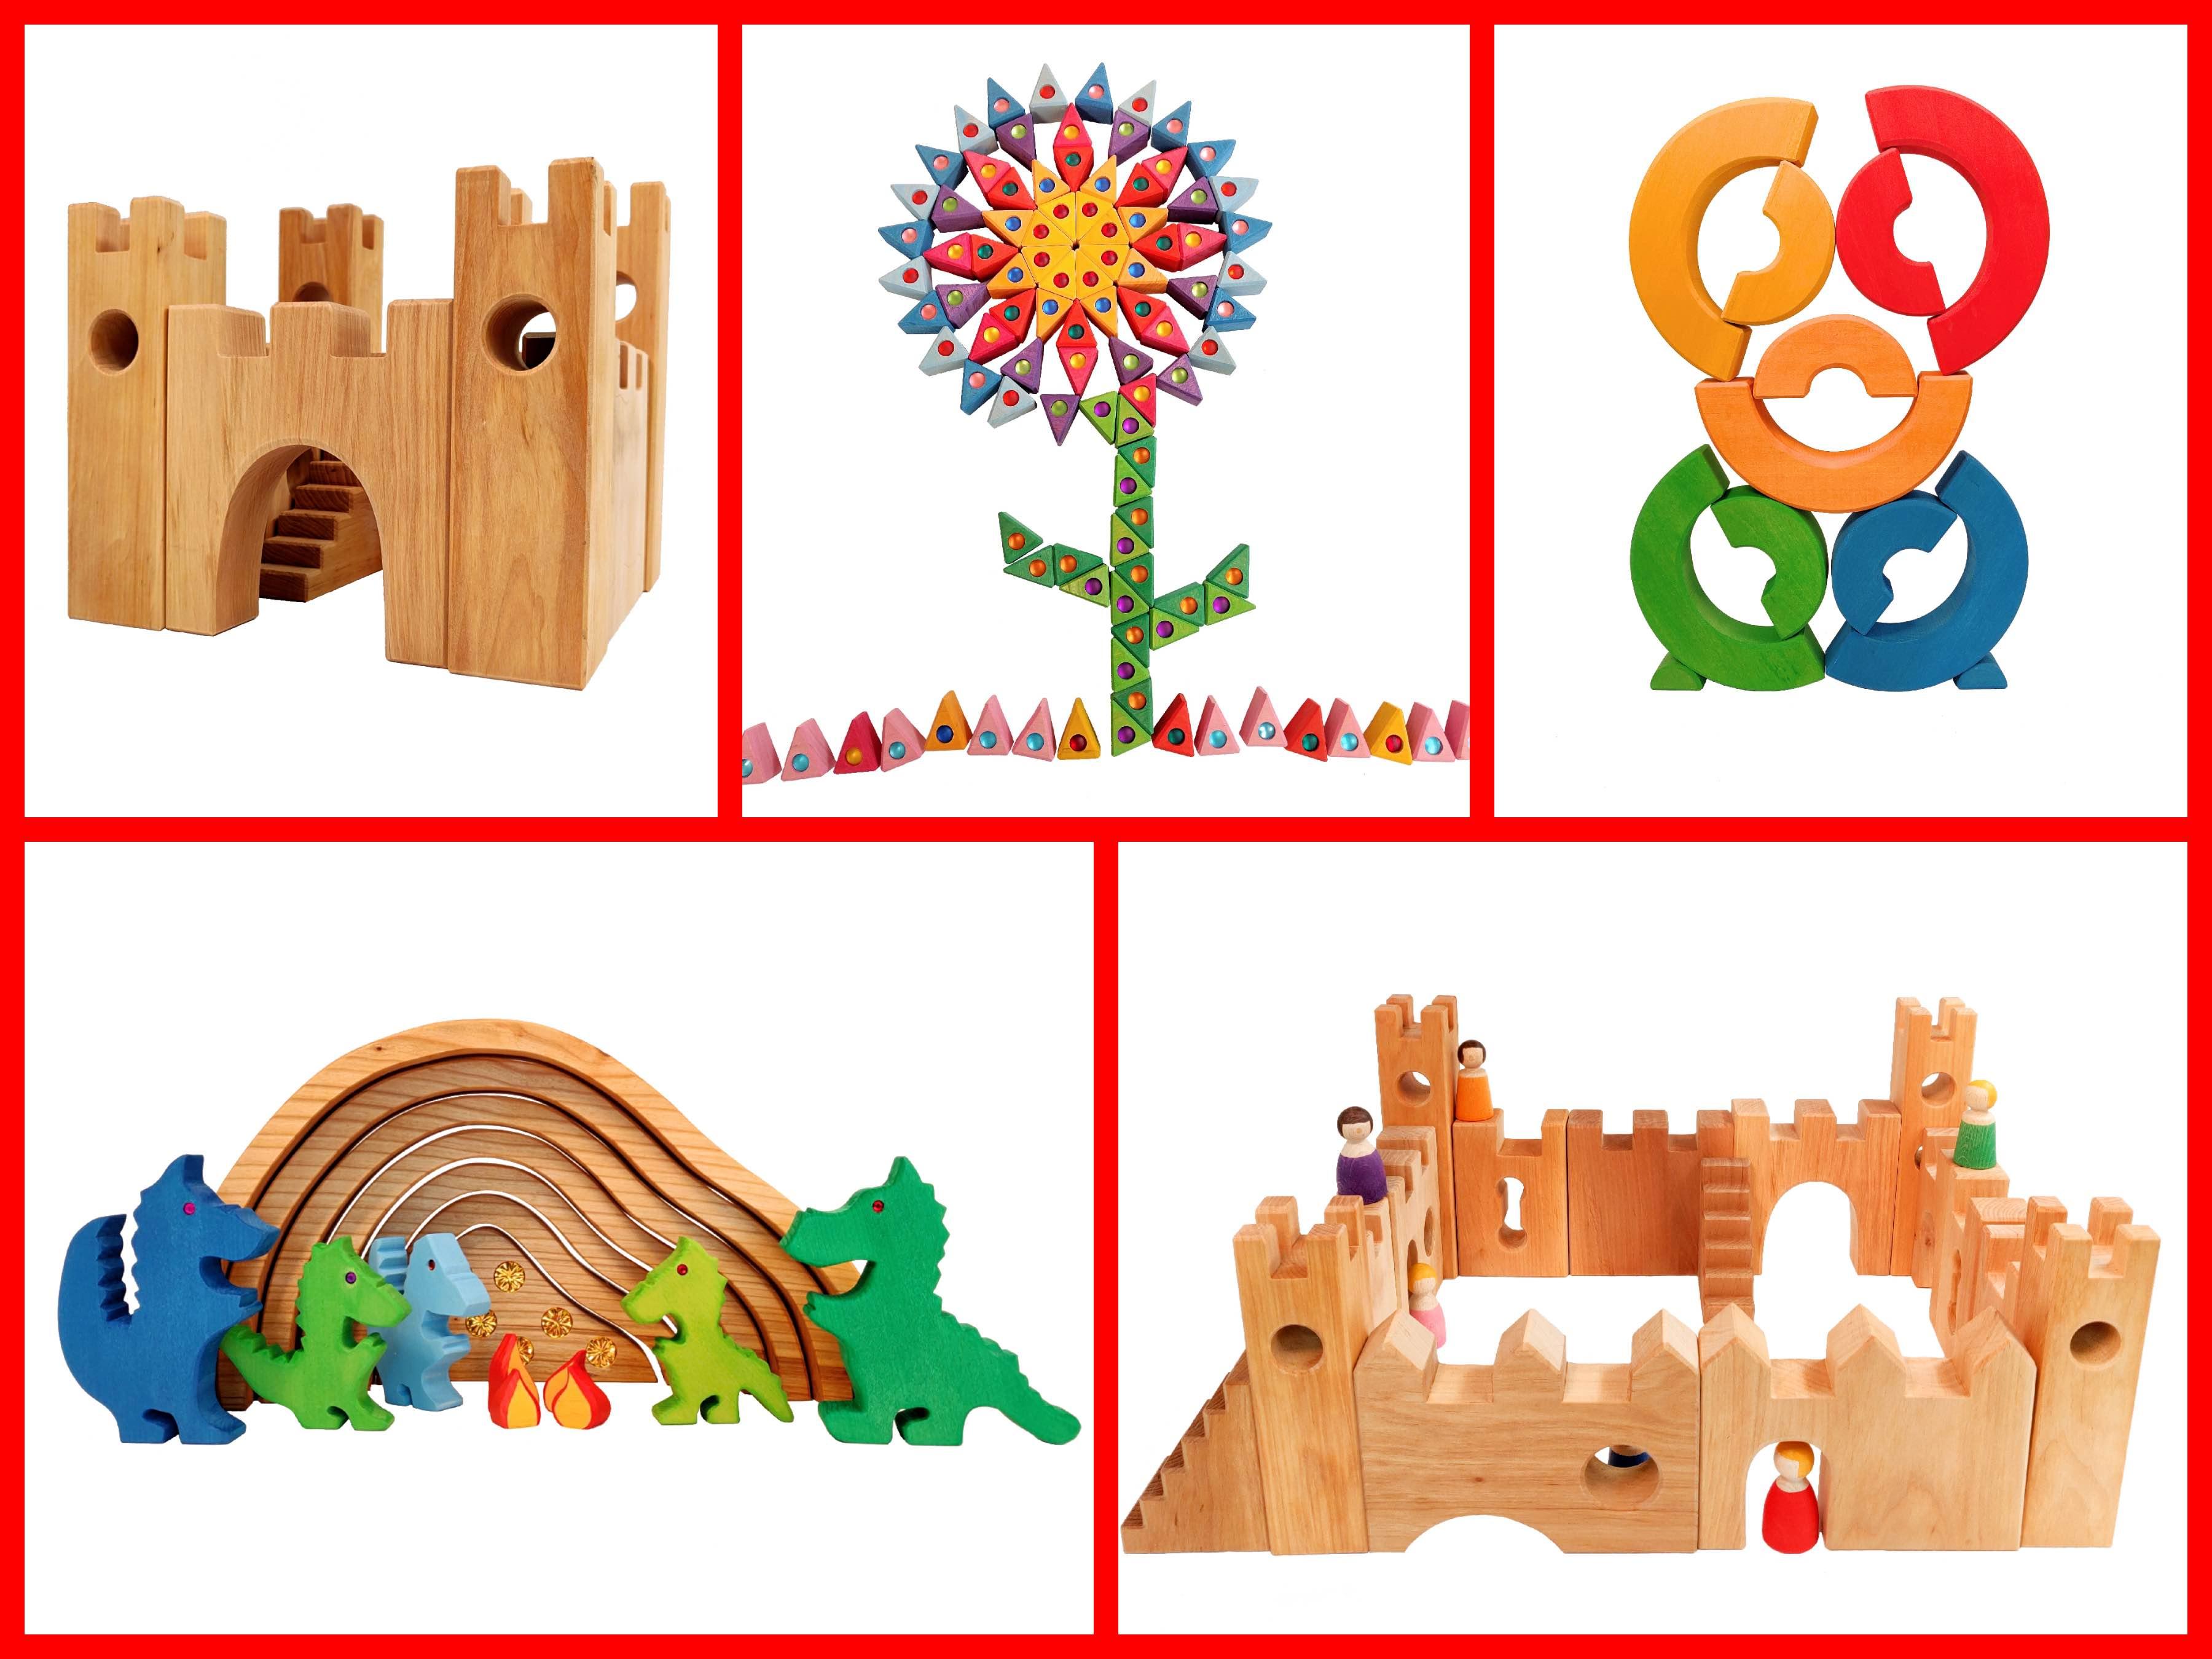 bauspiel houten speelgoed